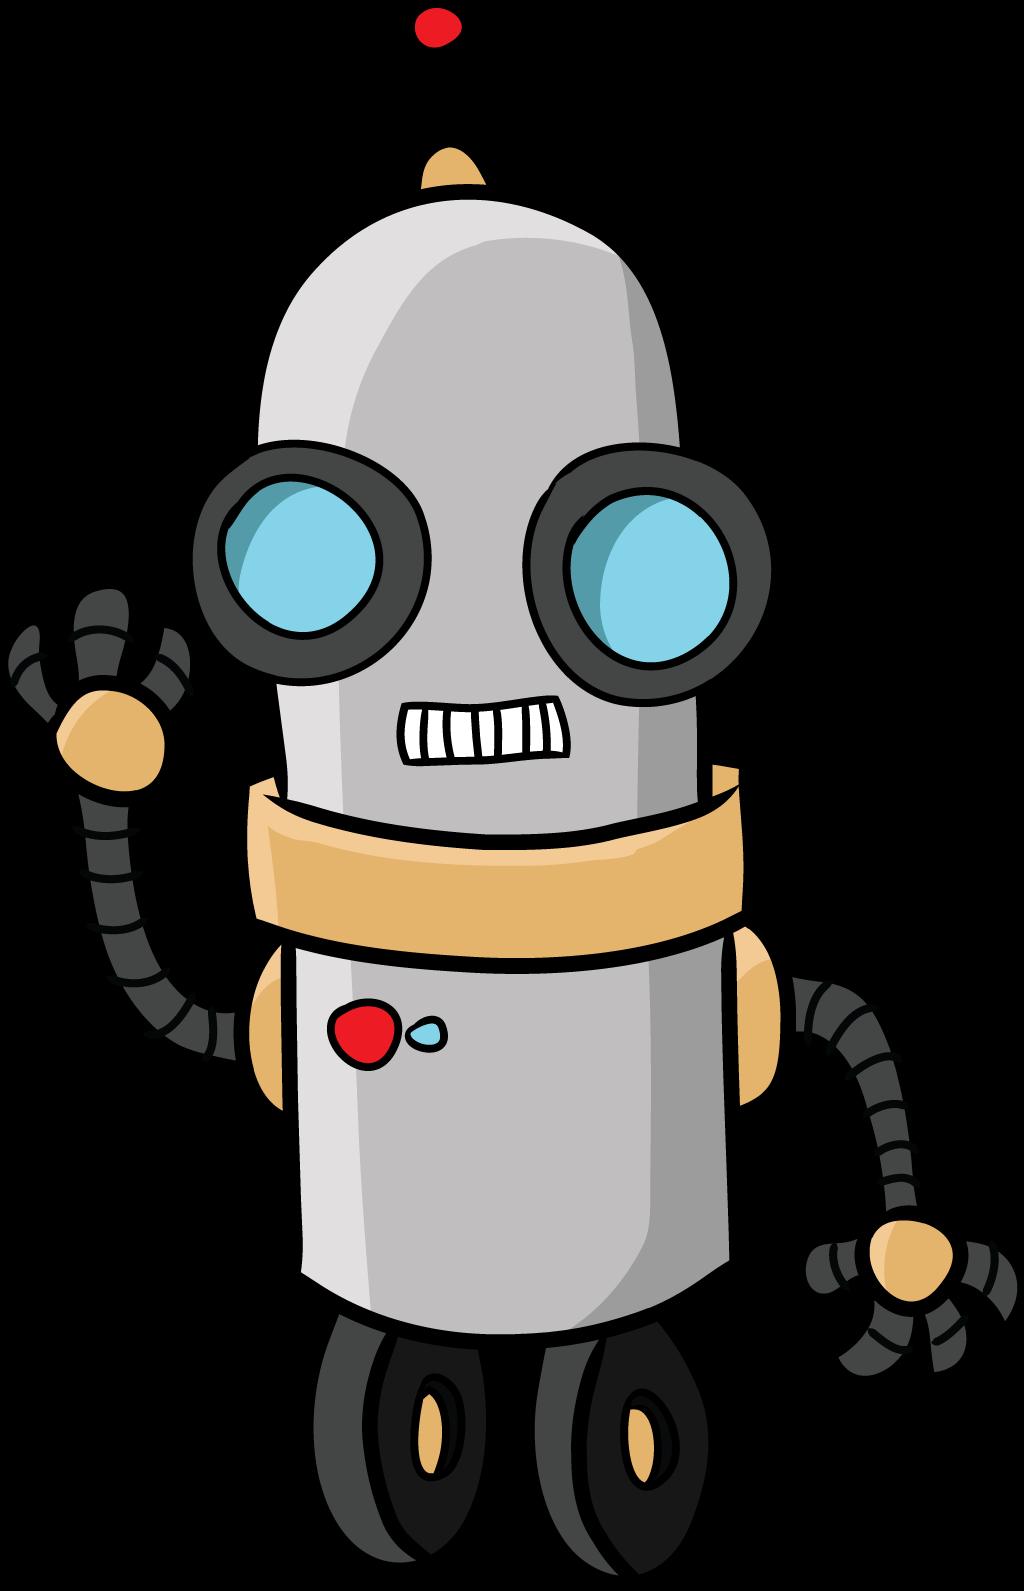 Cartoon Robot Toy : Robot clipart suggest